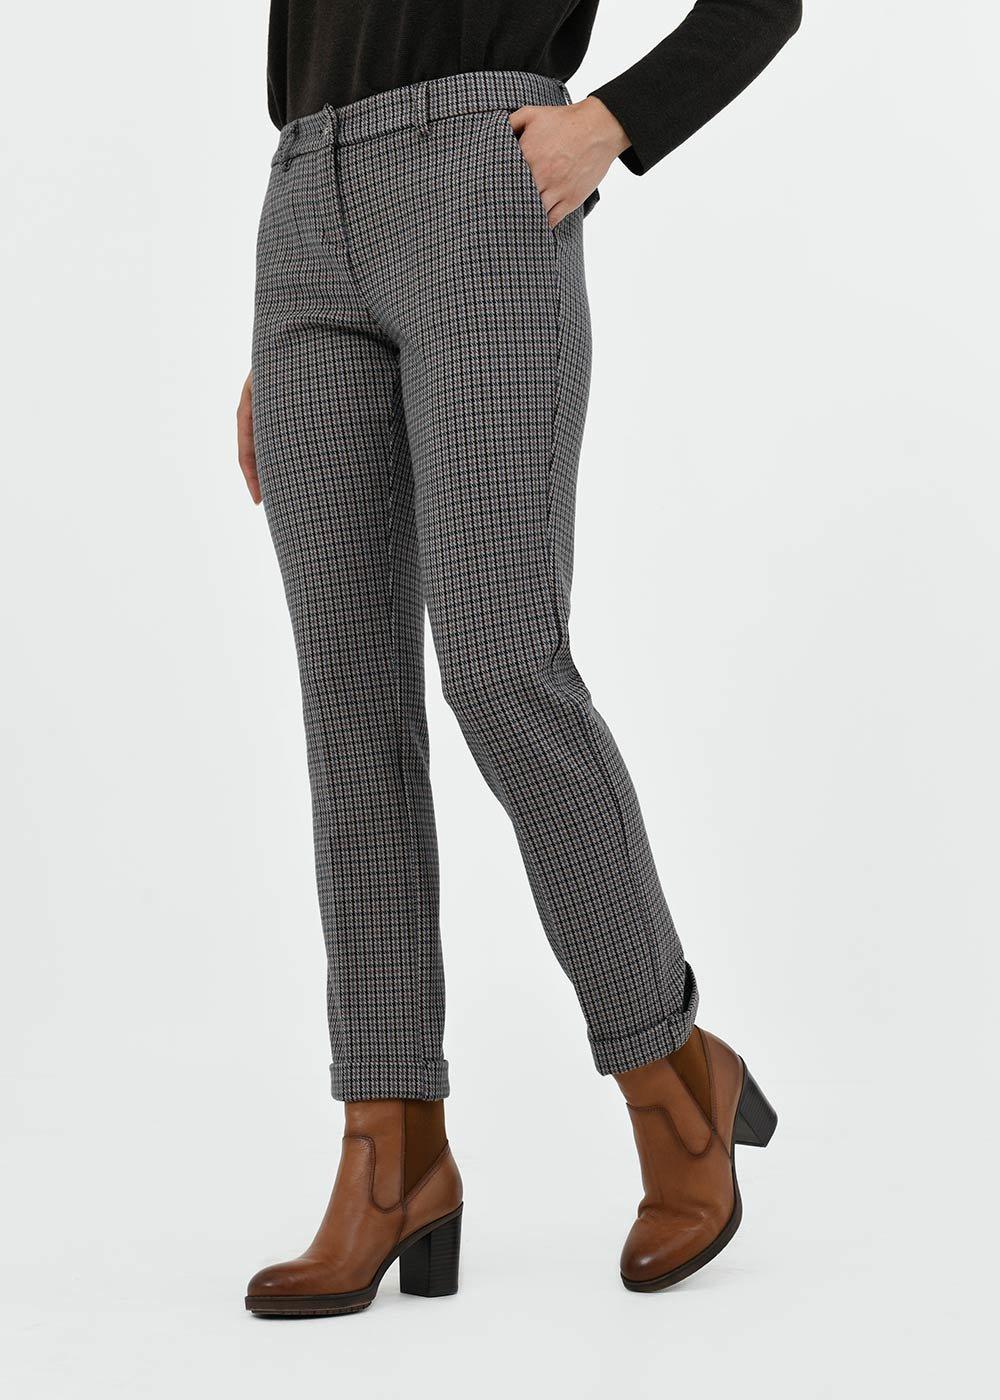 Bella trousers with micro check pattern - Avion \Mora Fantasia - Woman